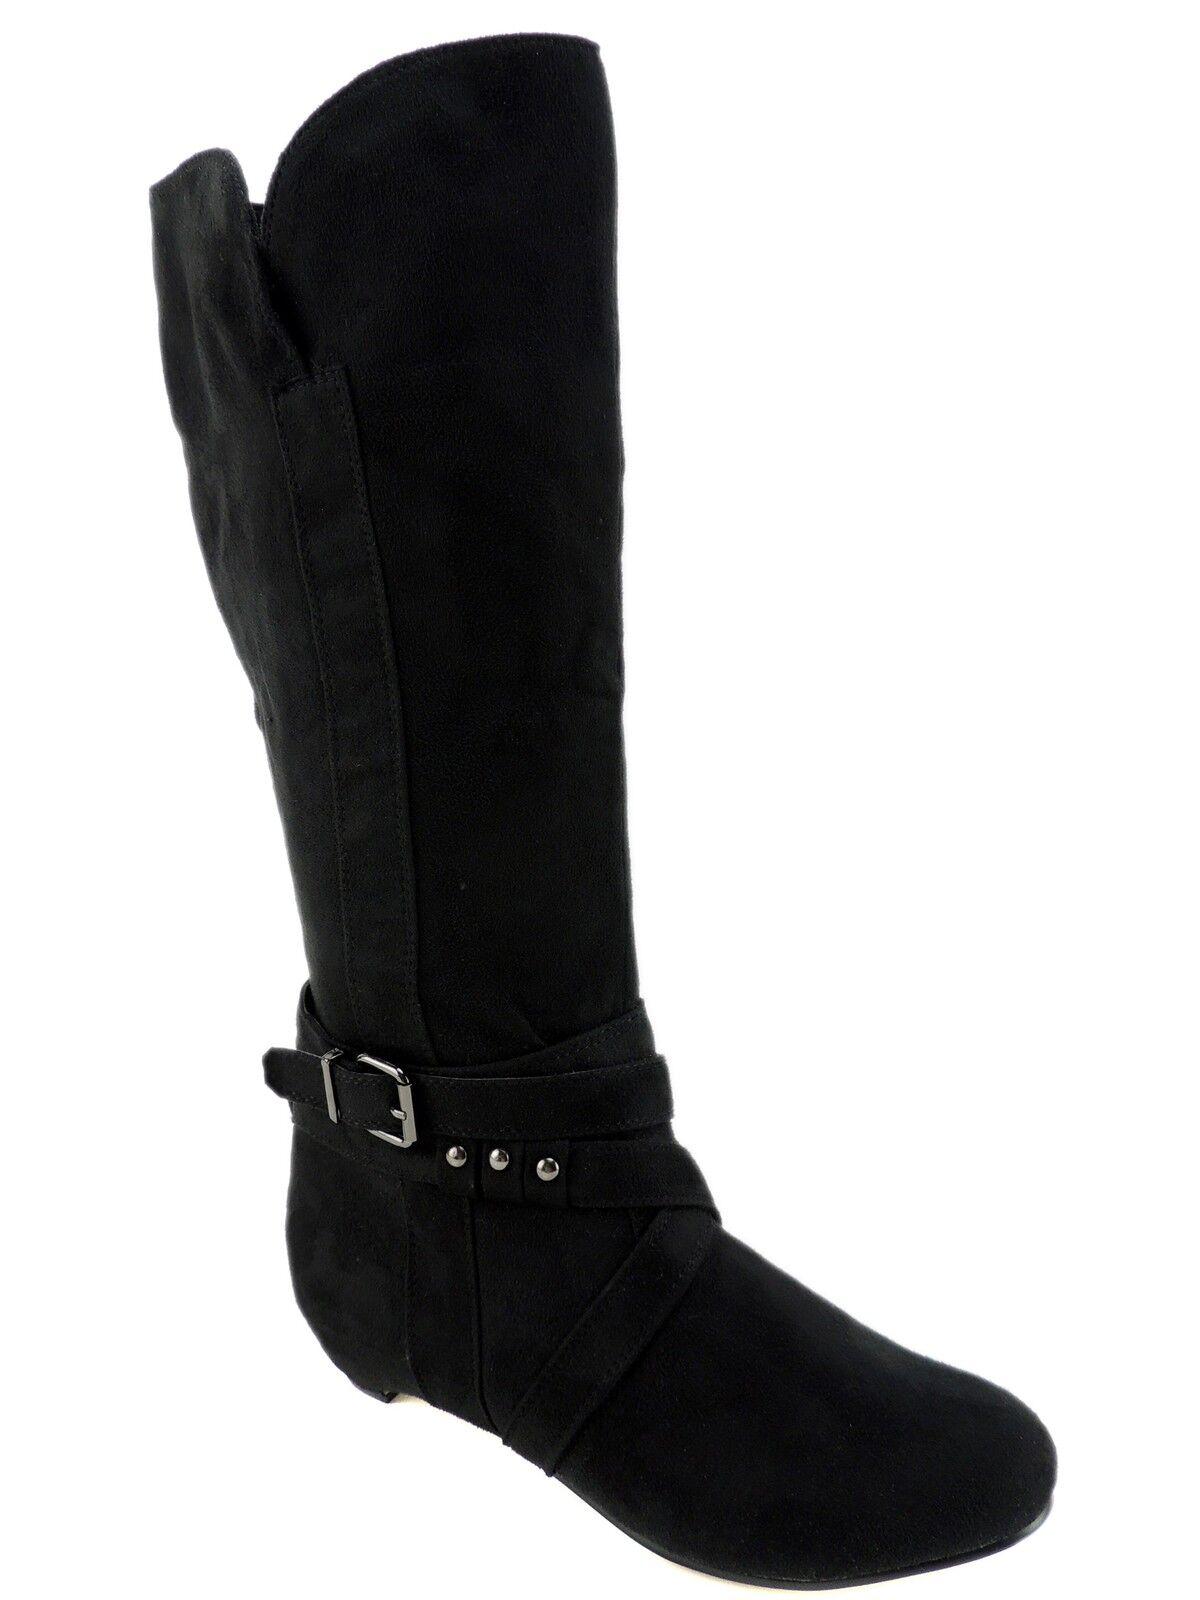 Journee Women's Link-19 Slouch Boots Faux Suede Black Size EU 38 1/2/US 8.5 M